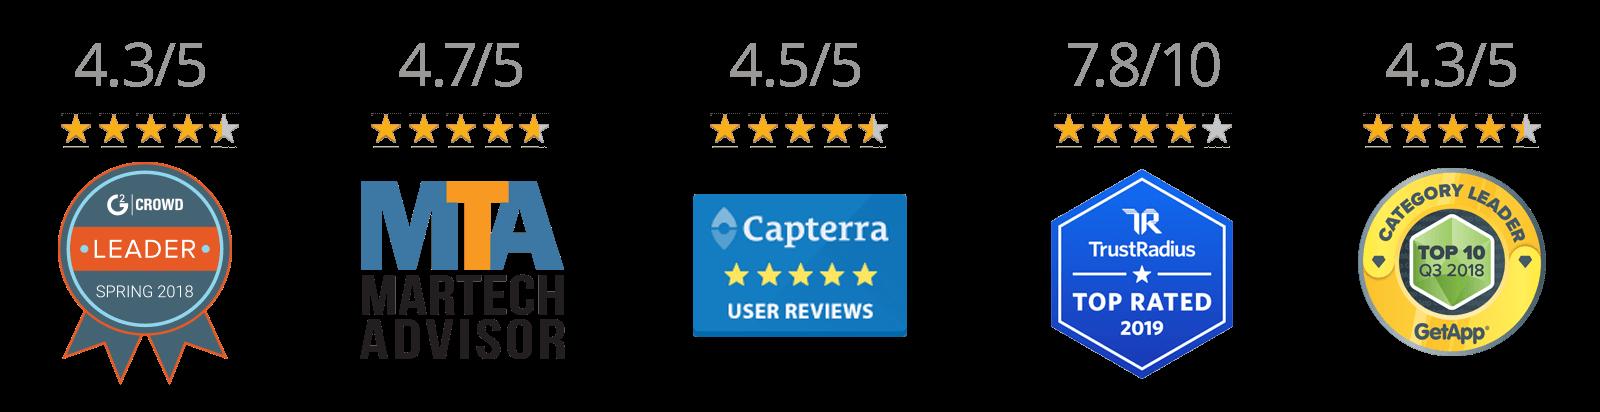 SharpSpring Review Site-badges